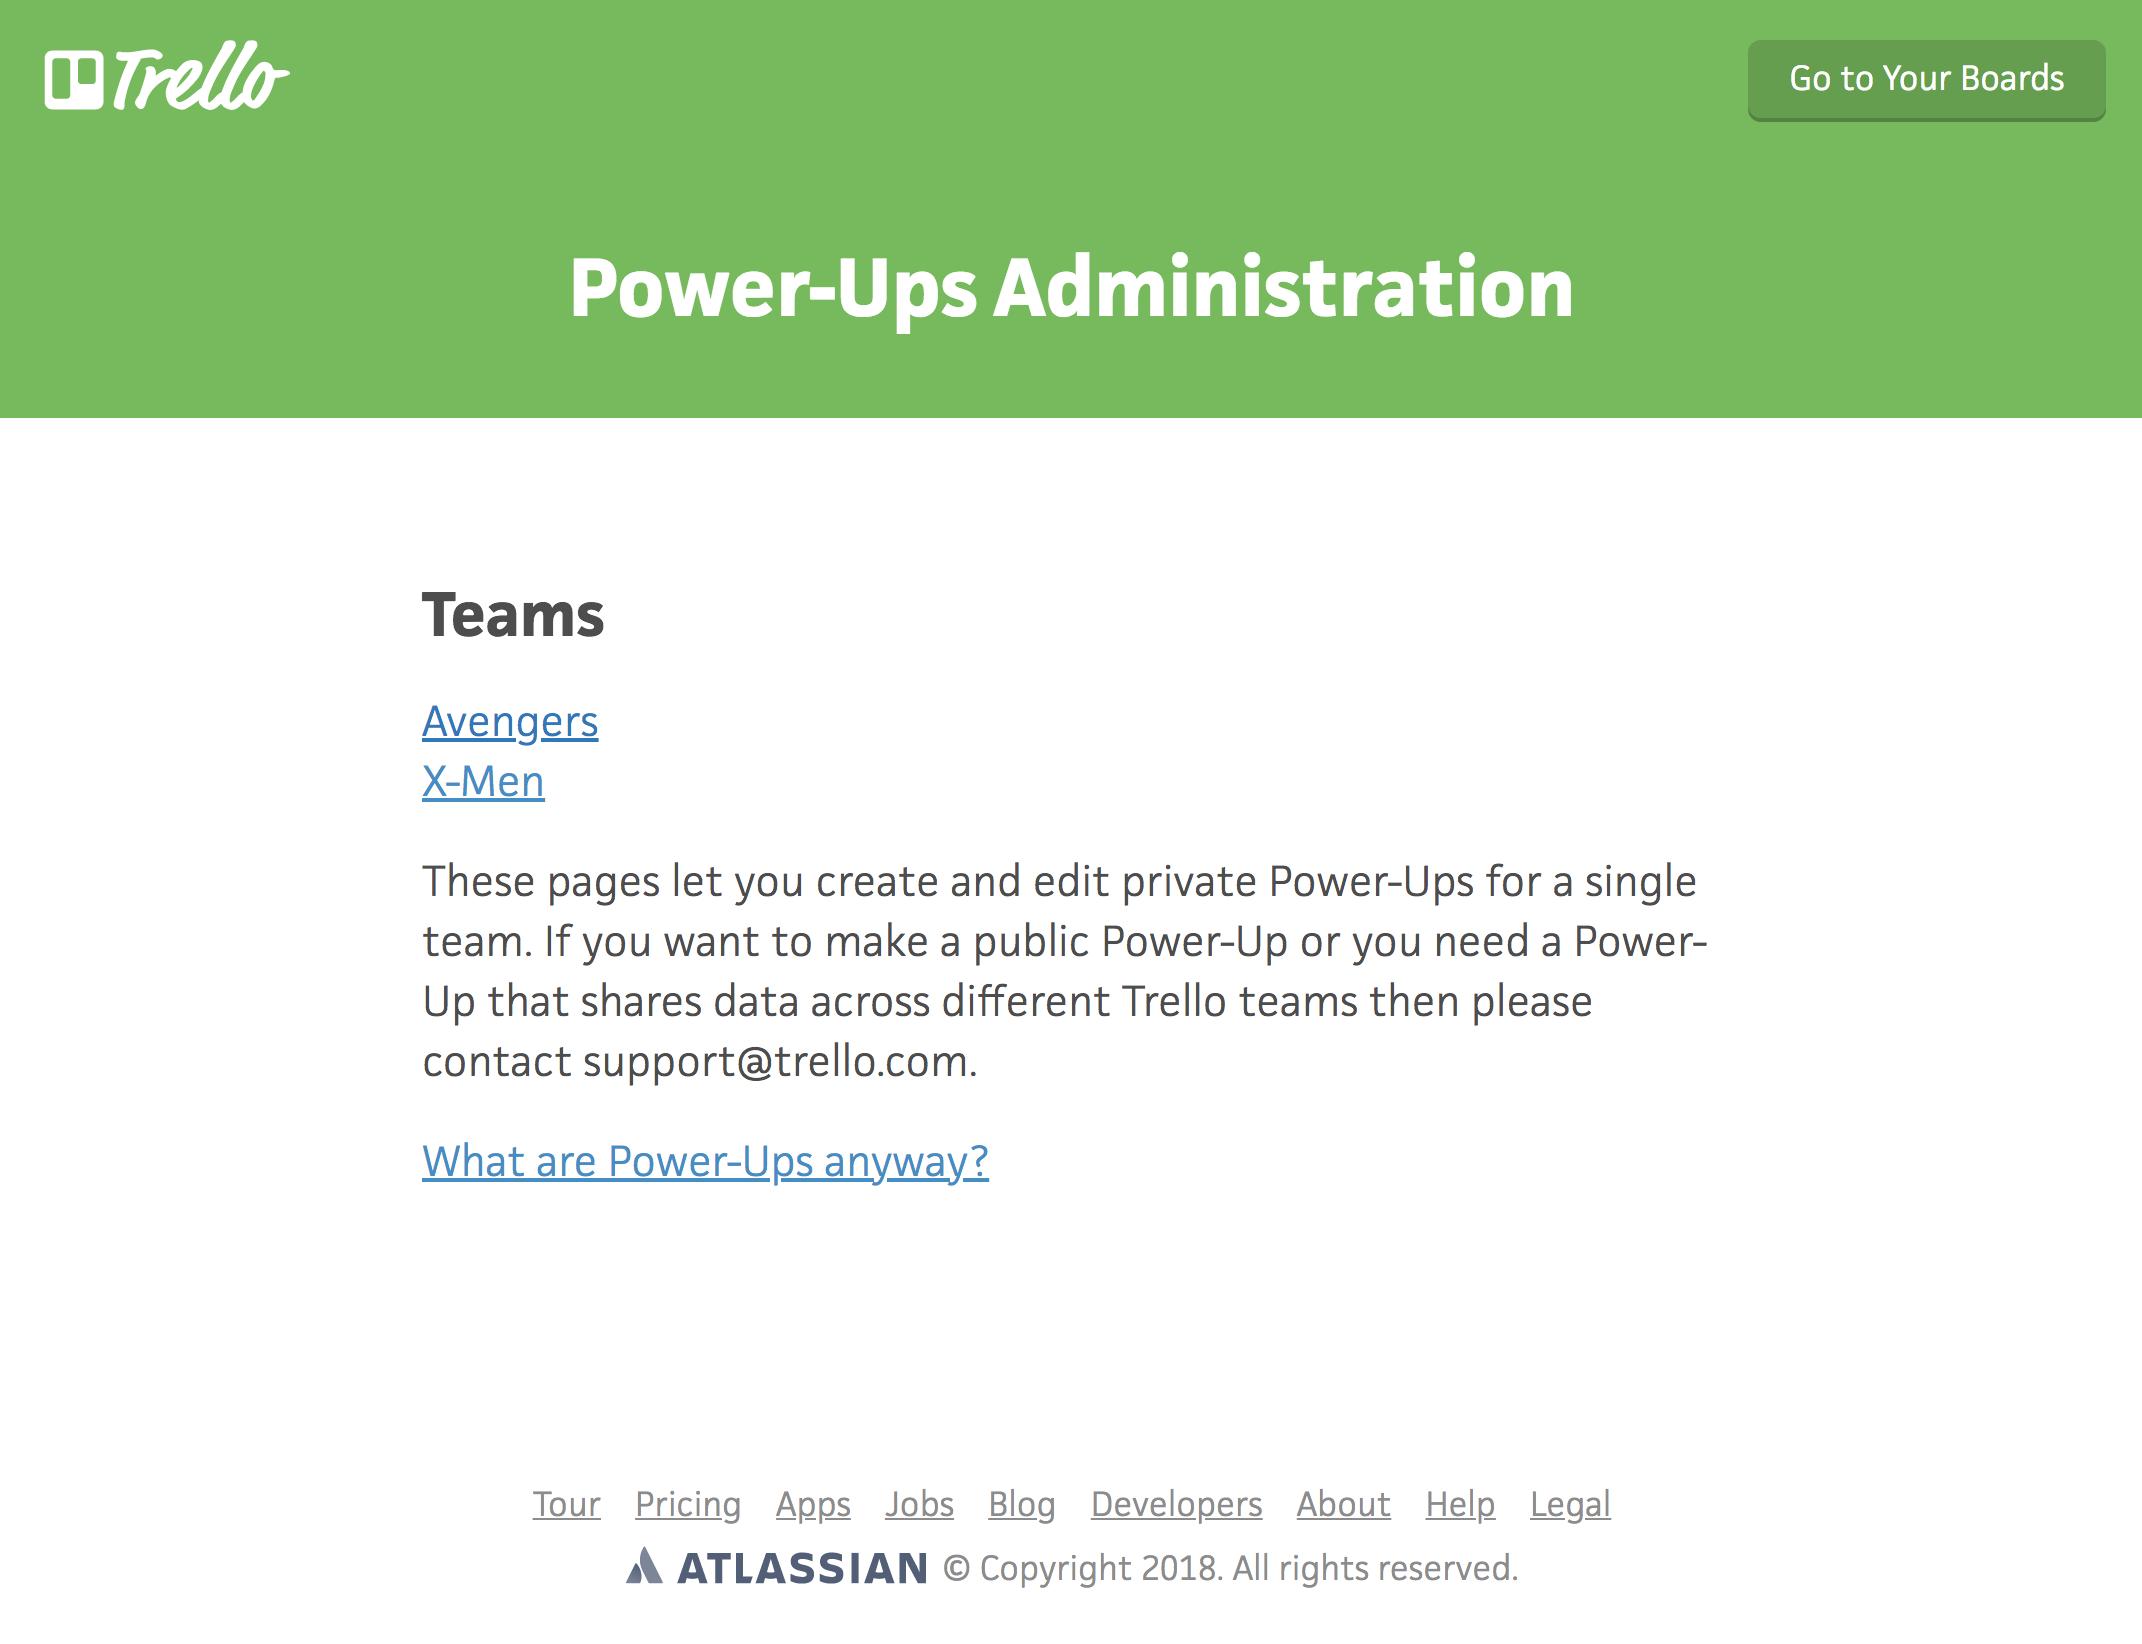 managing power-ups